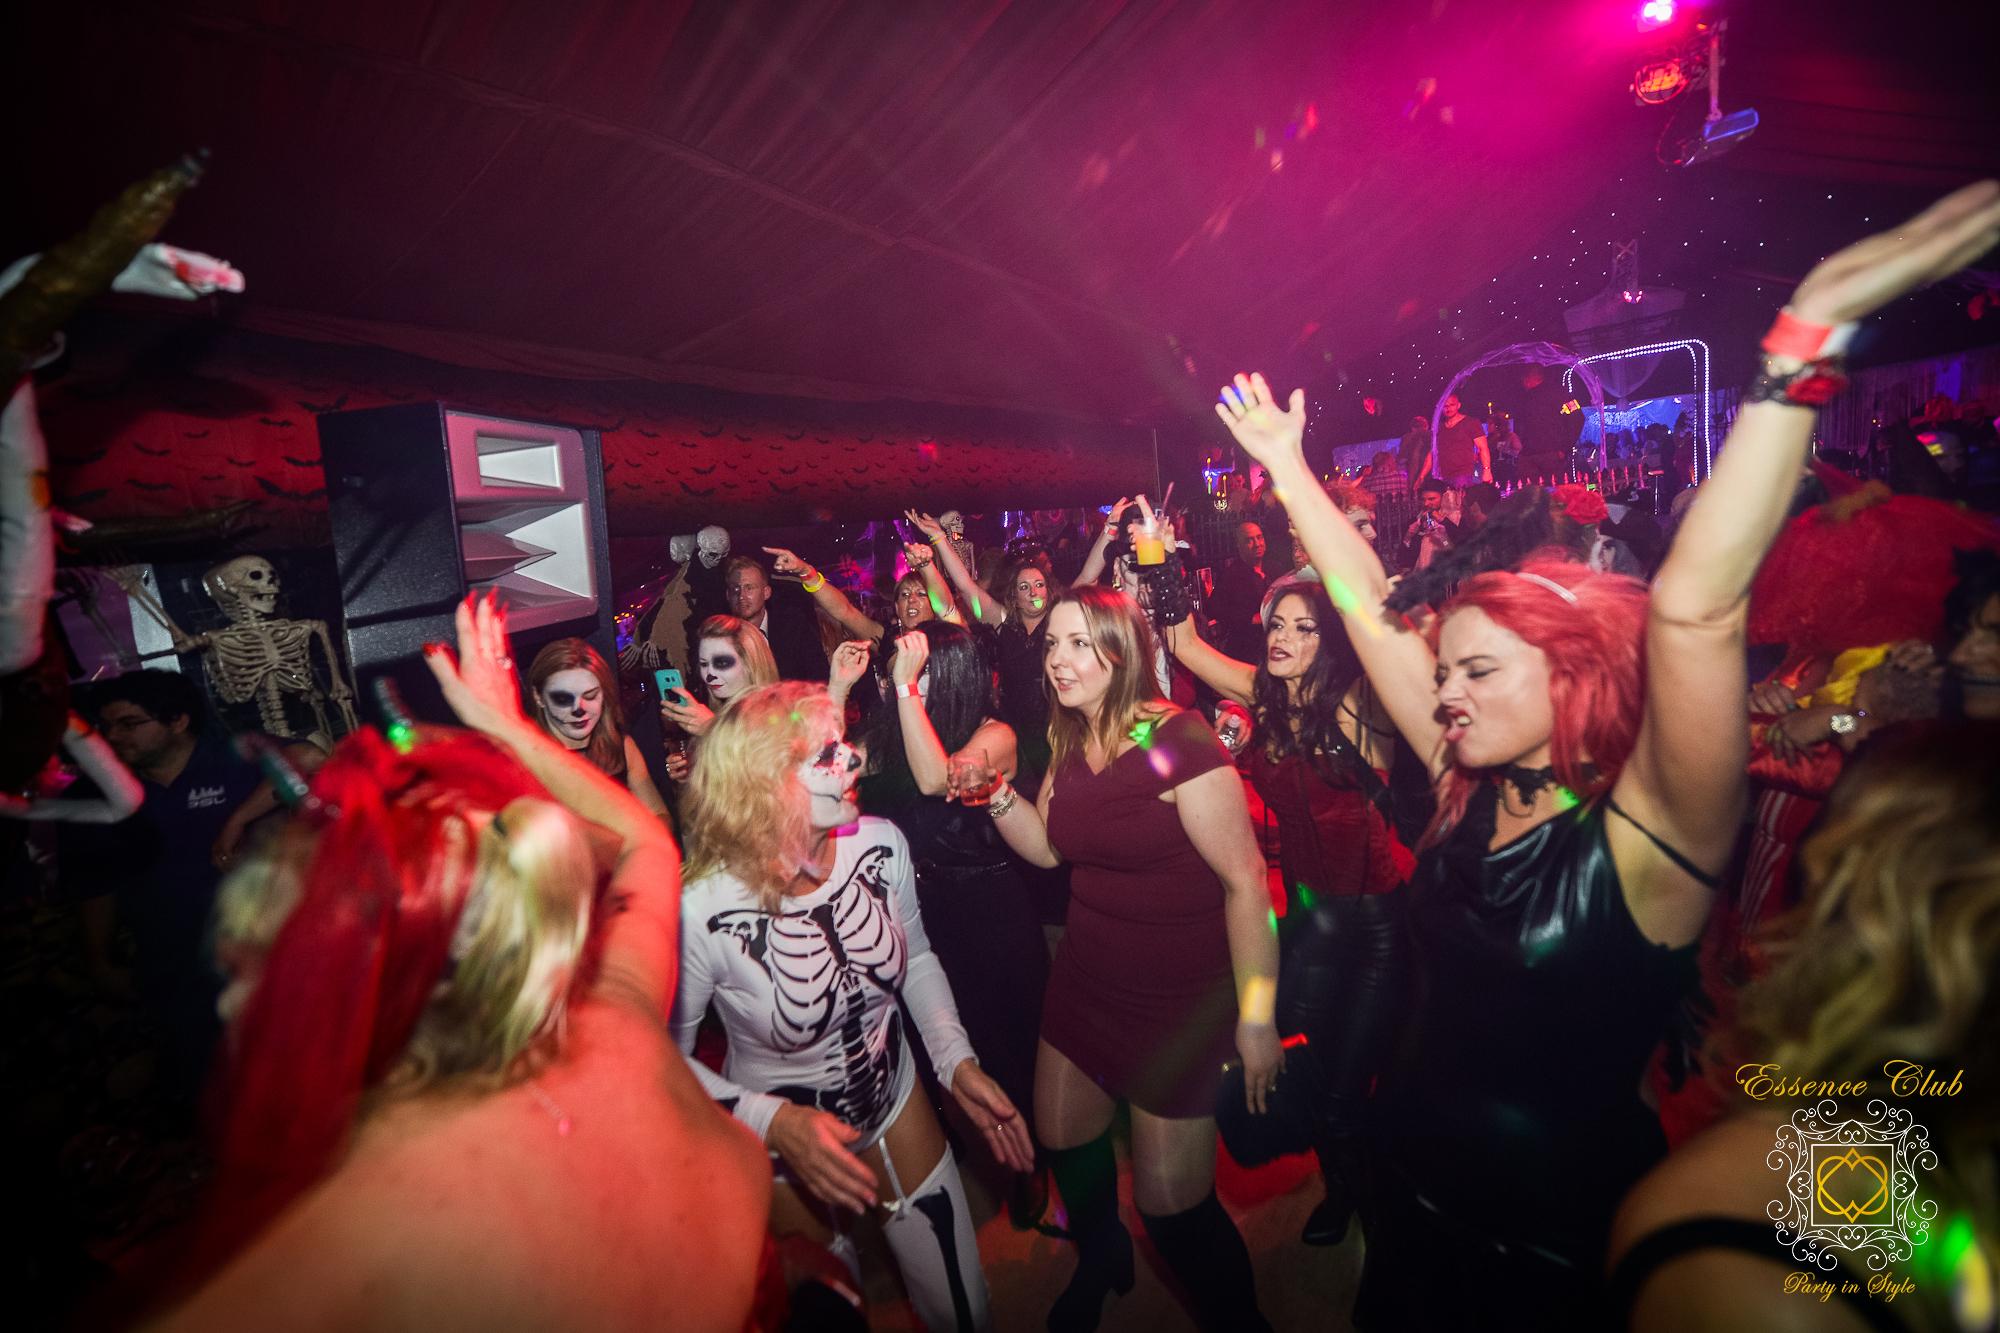 Heaven and hell dance floor event